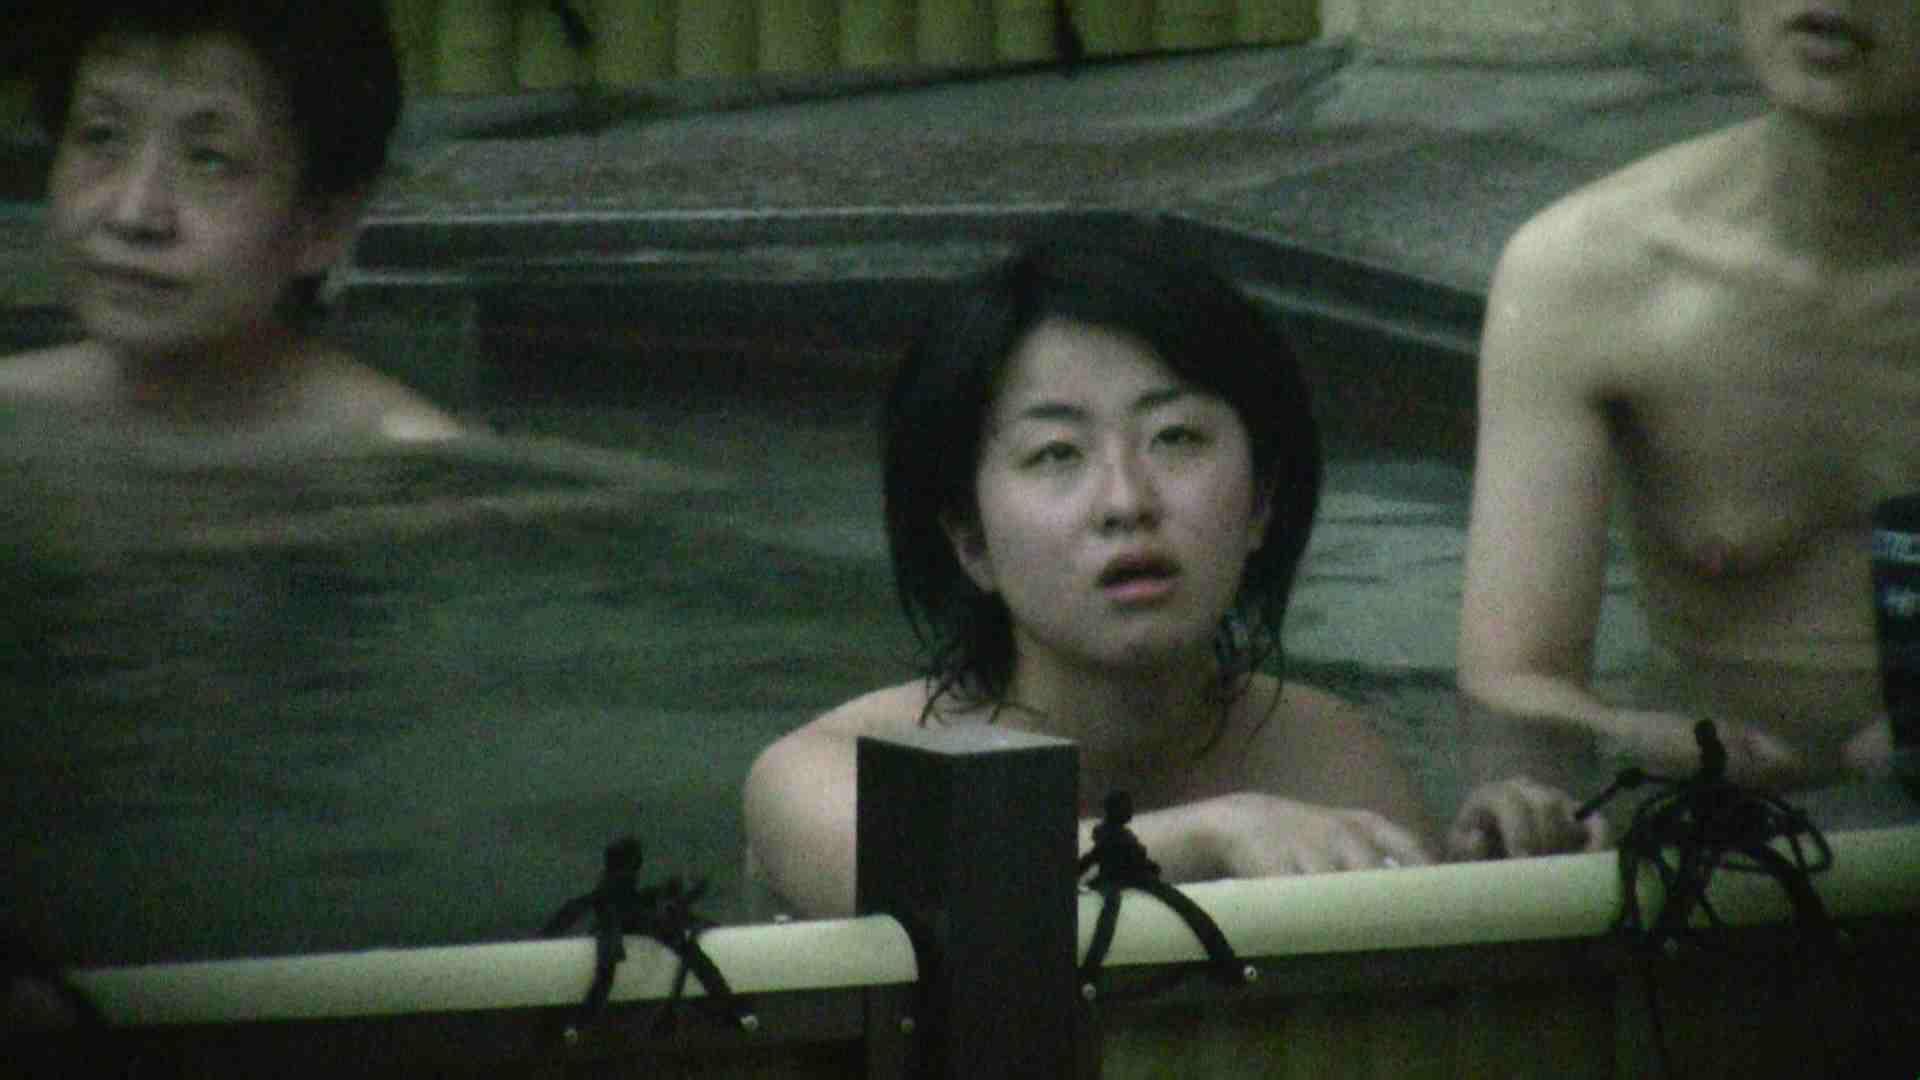 Aquaな露天風呂Vol.112 0  68連発 8